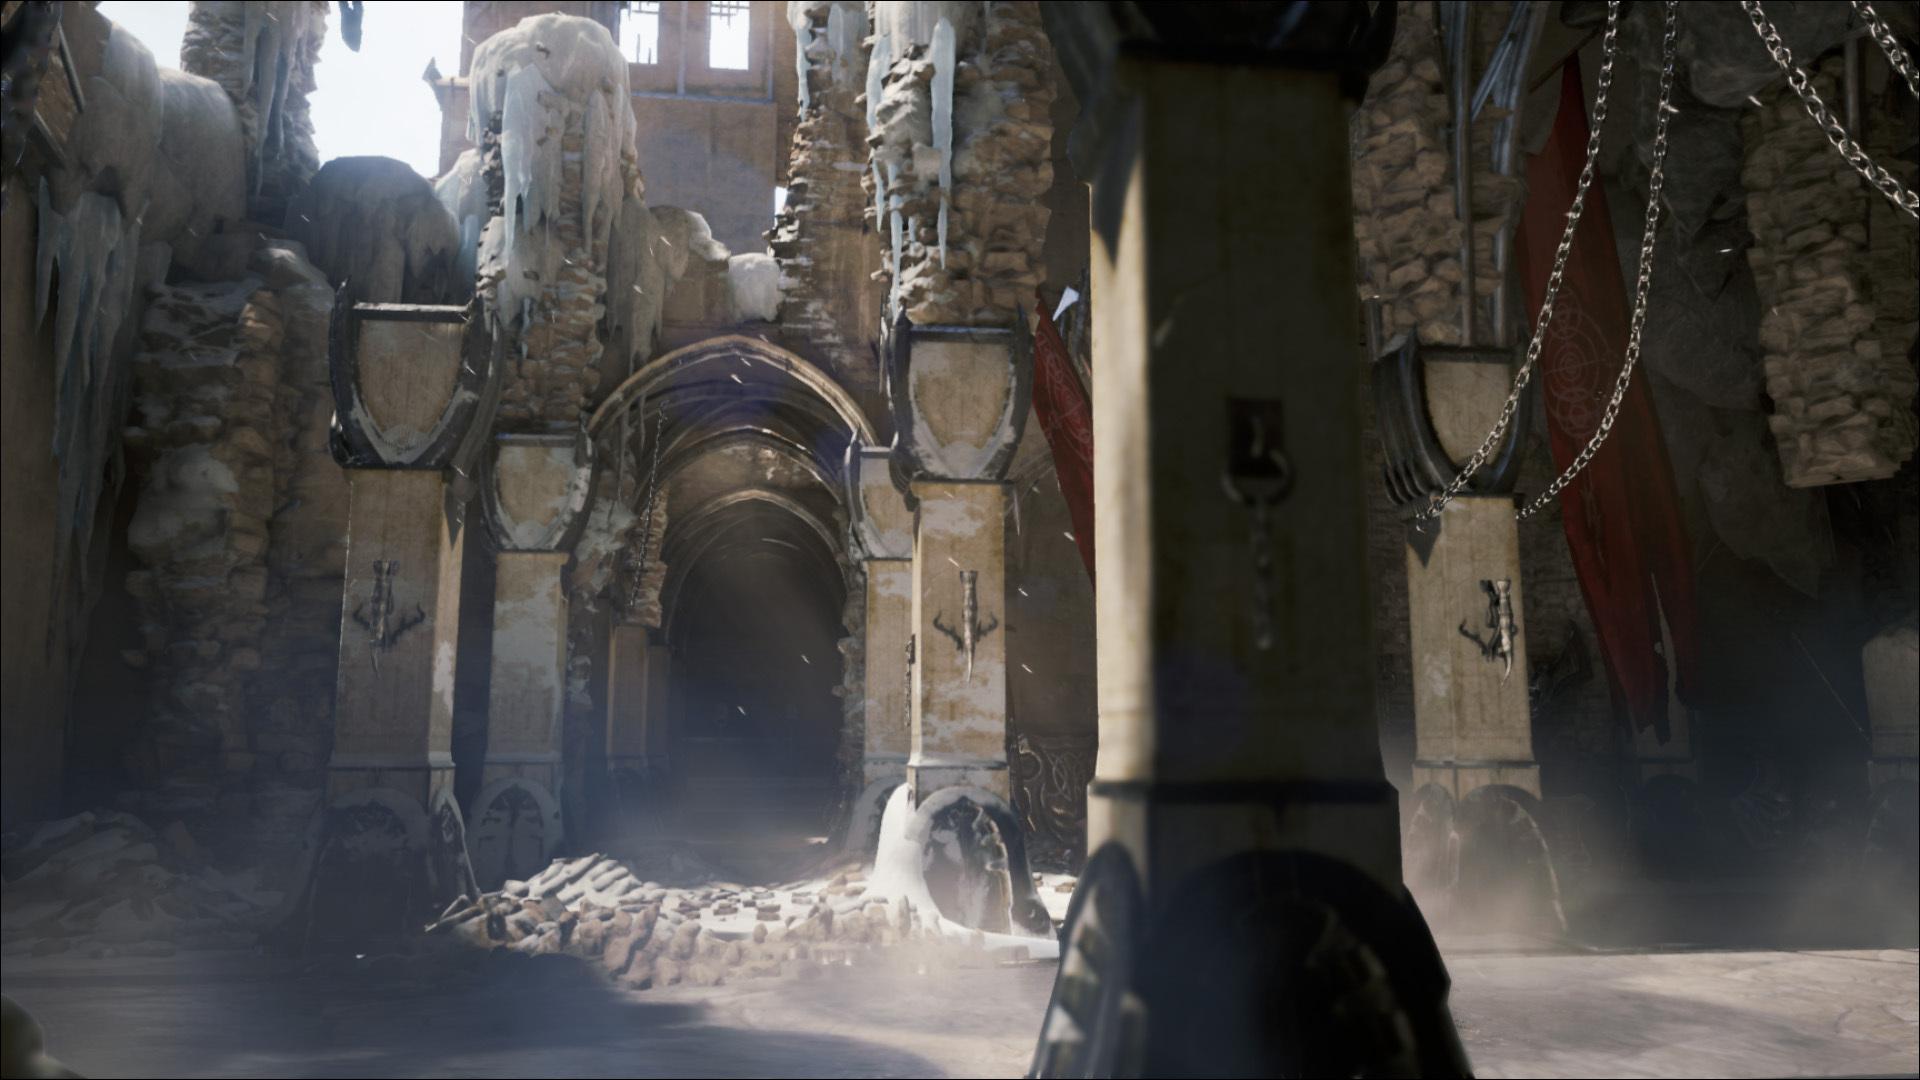 Benchmark Unreal Engine 4's